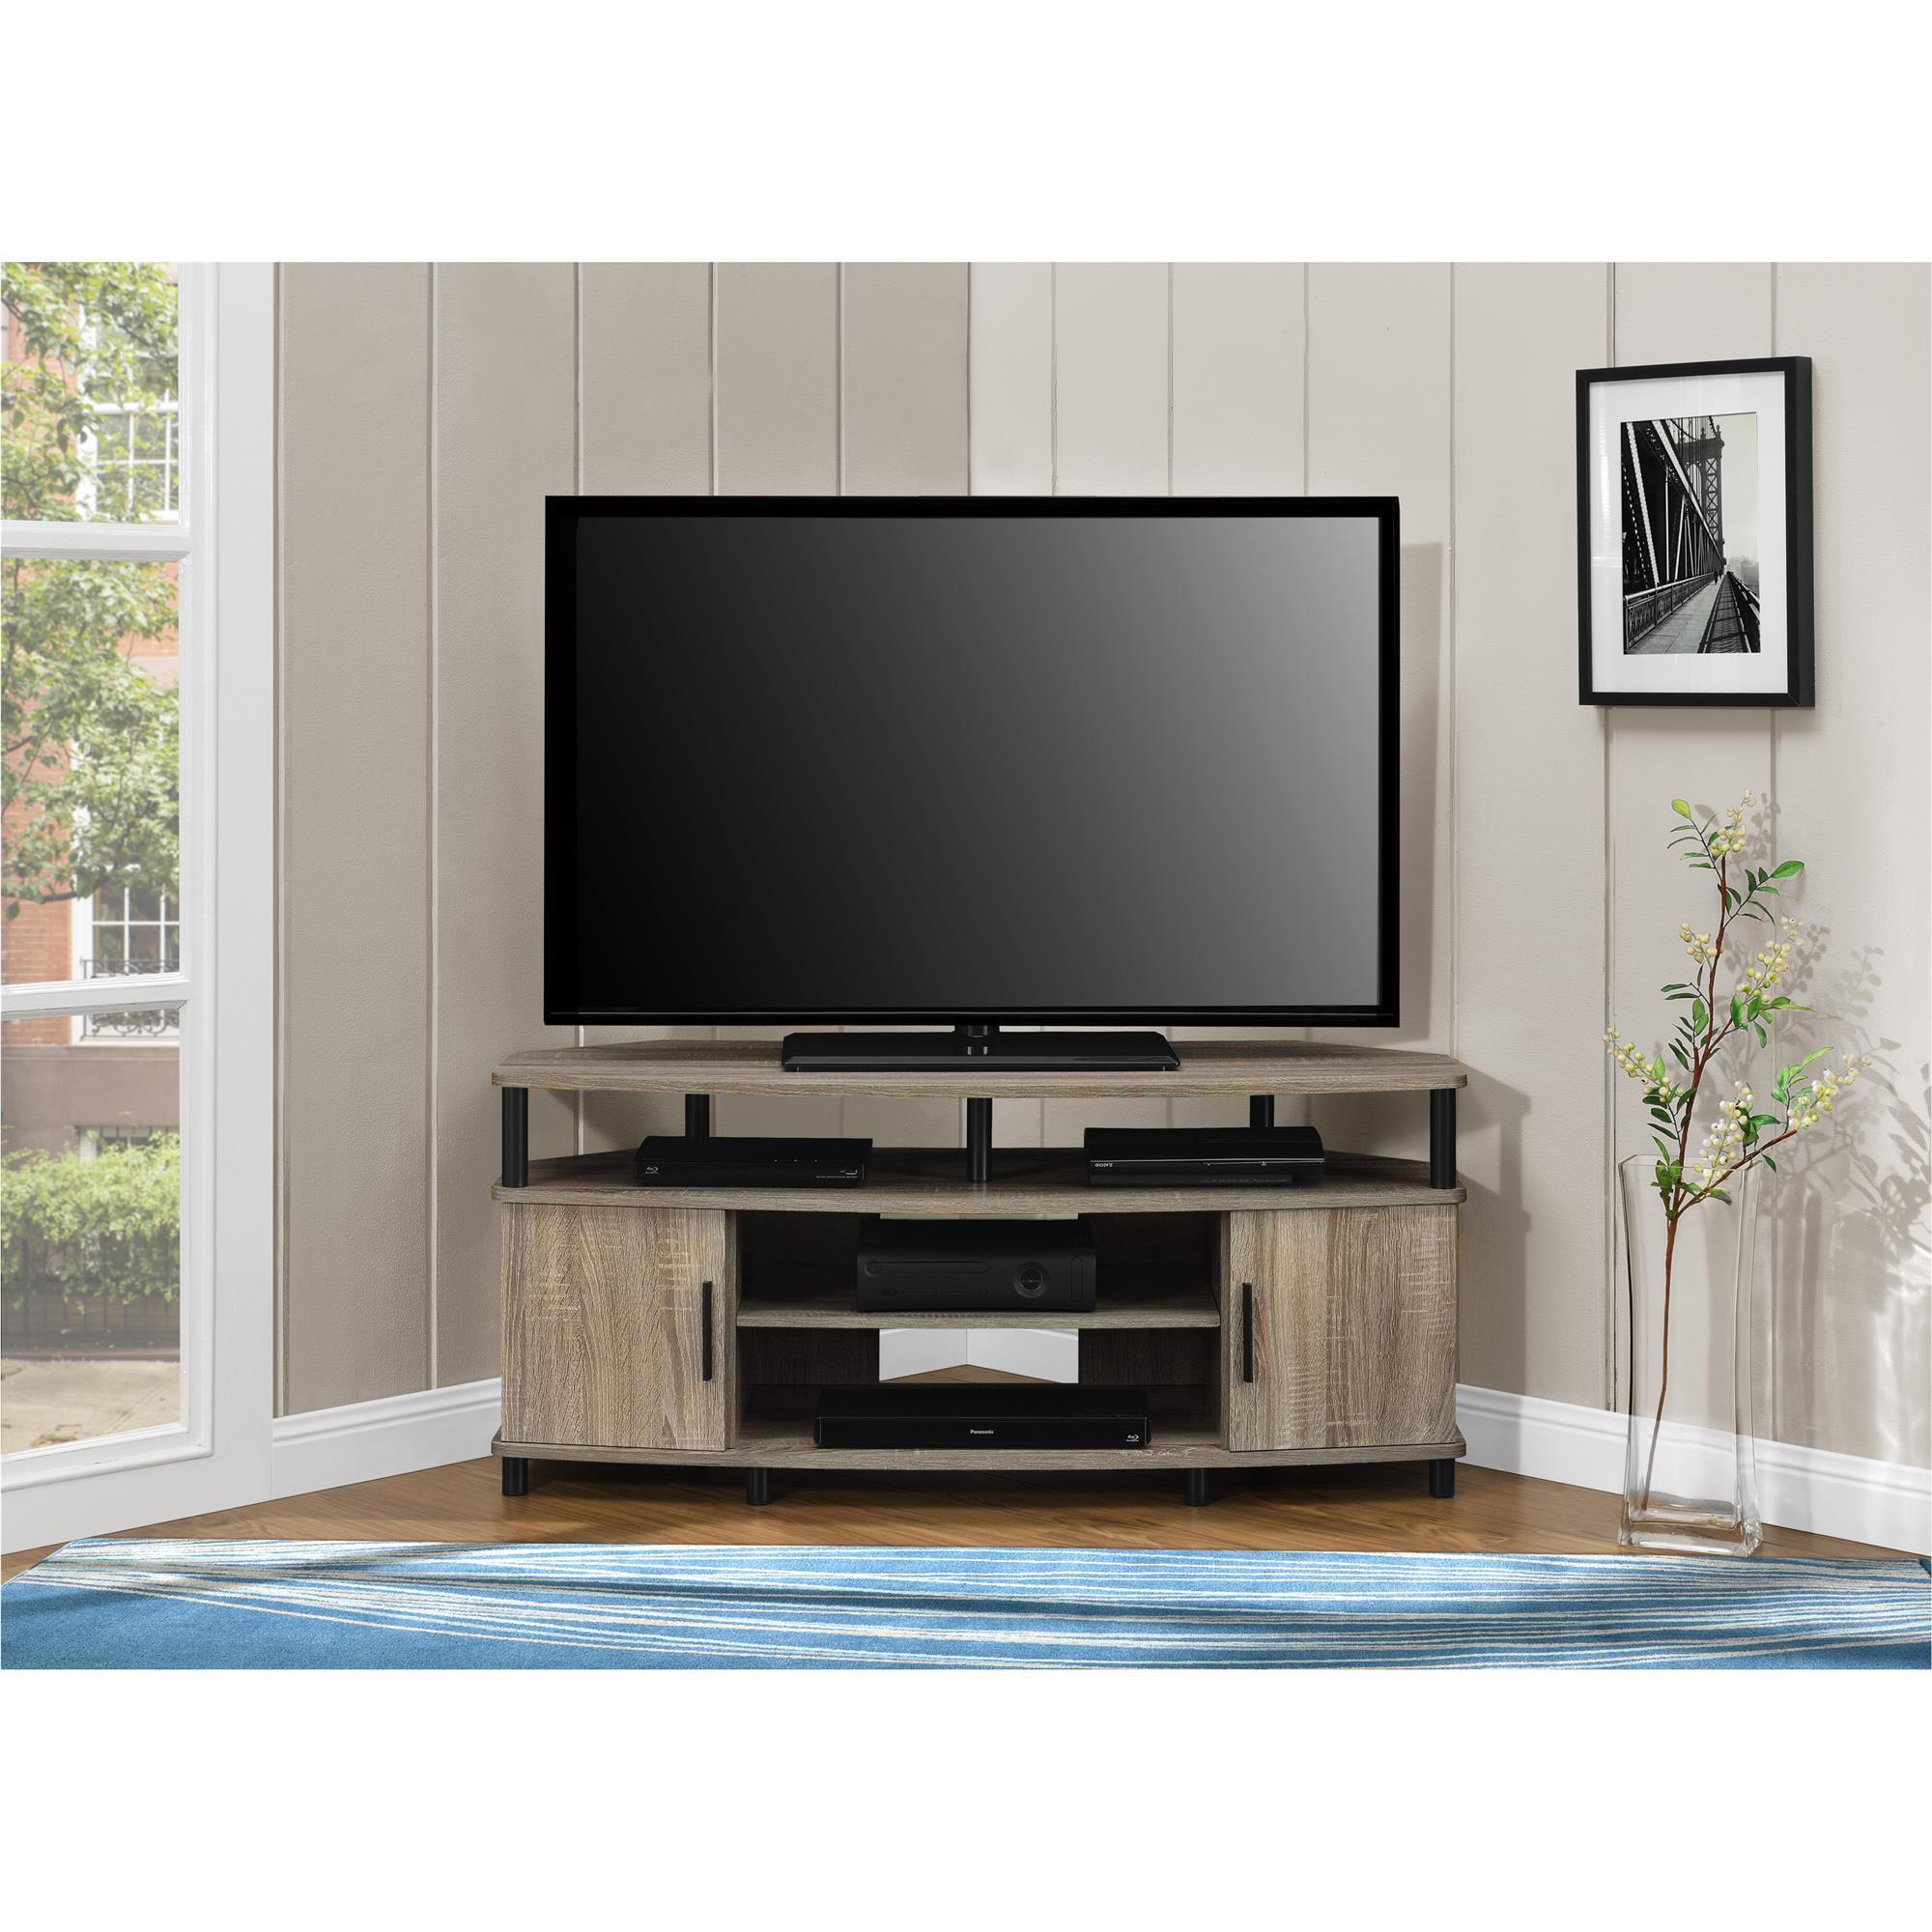 Shop Ameriwood Home Carson 50 Inch Sonoma Oak Corner Tv Stand Free